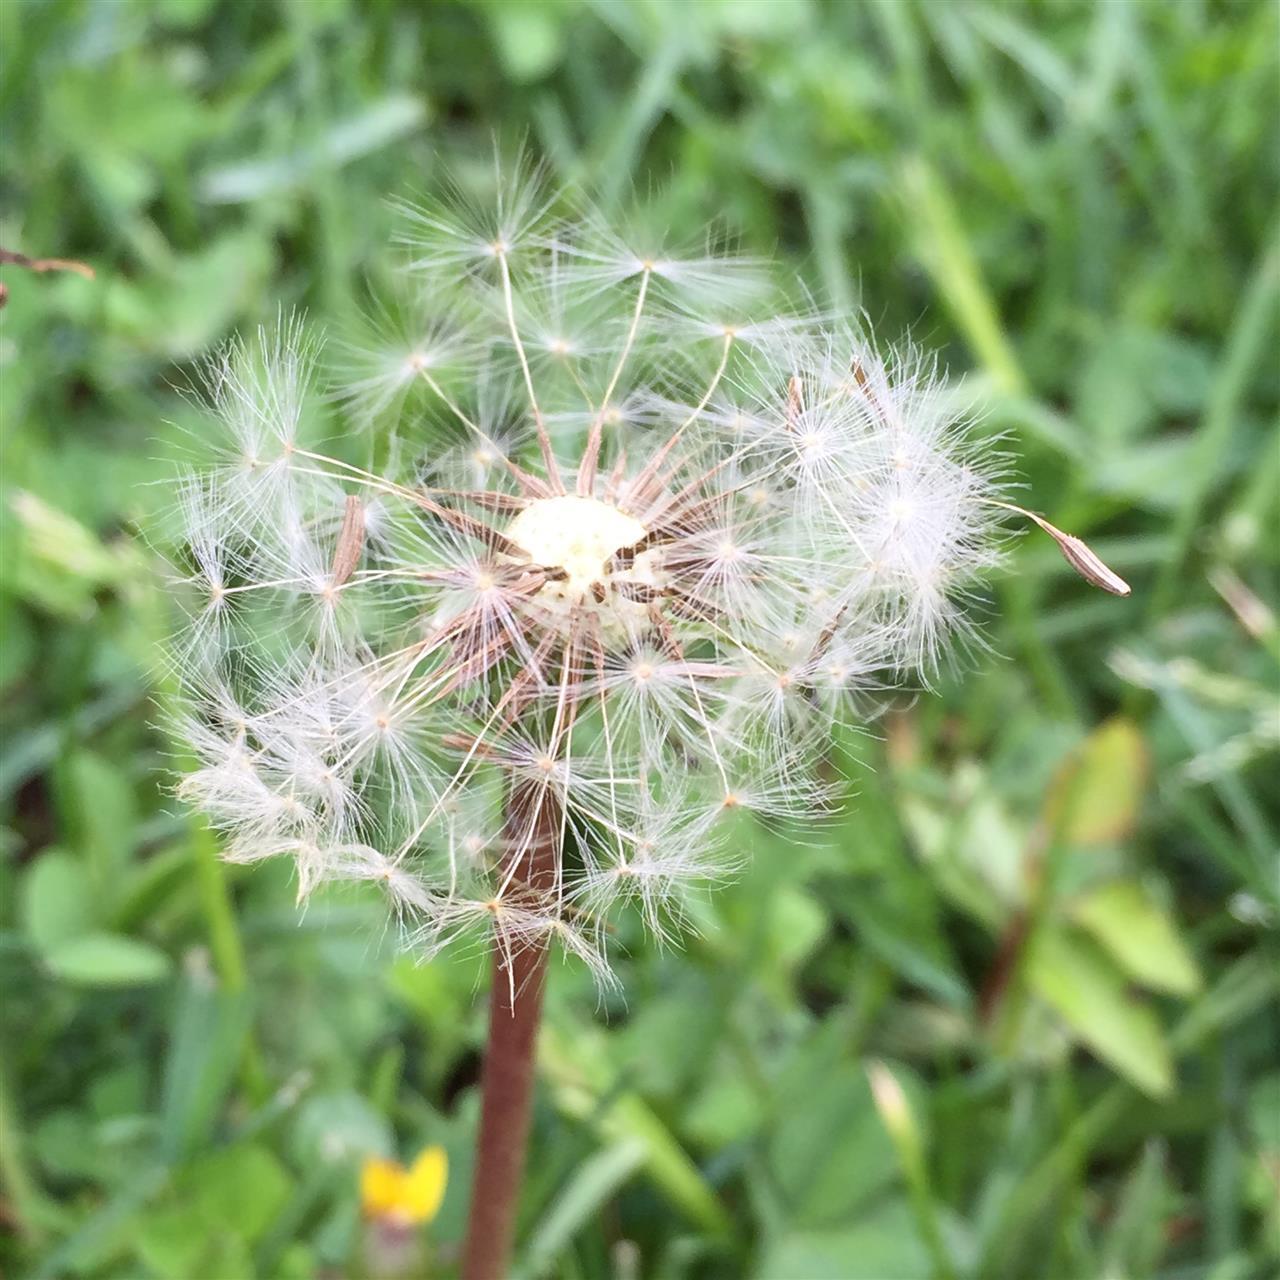 Dandelions, a sure sign spring has come to town ~ Birmingham, Michigan #LeadingRElocal #Birmingham #Michigan